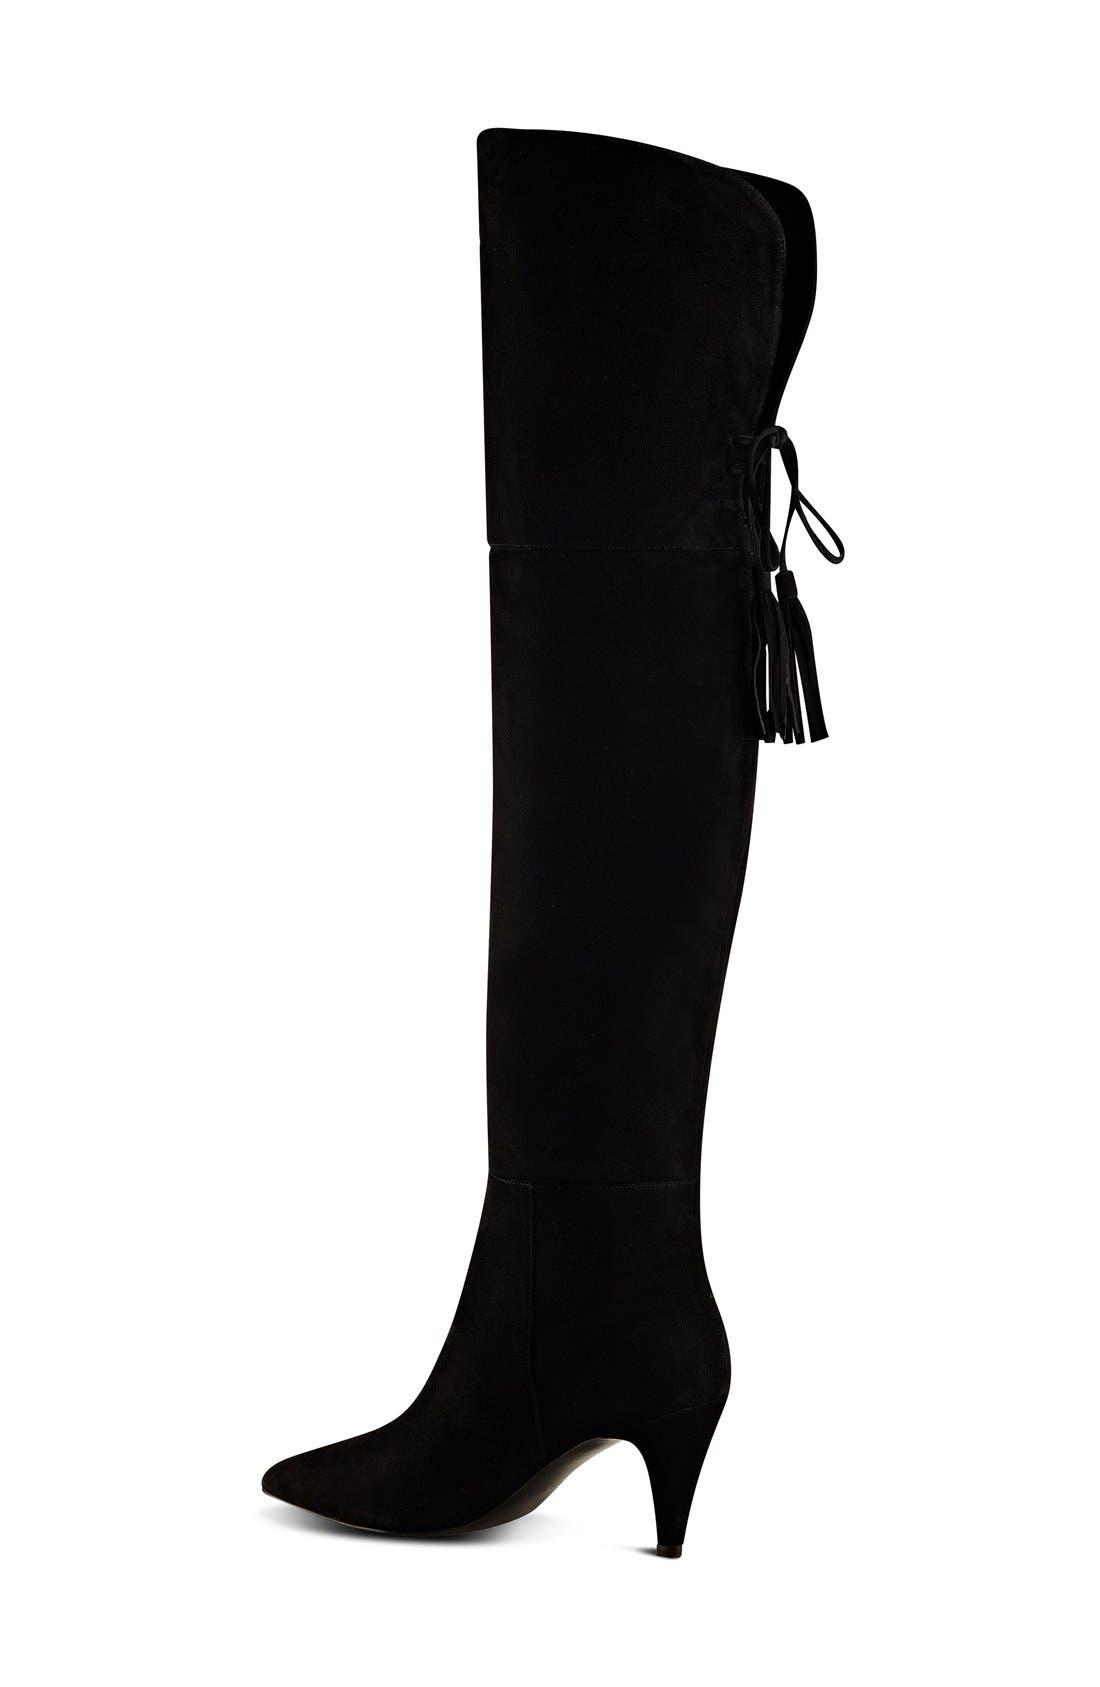 NINE WEST,                             'Josephine' Over the Knee Tassel Boot,                             Alternate thumbnail 3, color,                             001